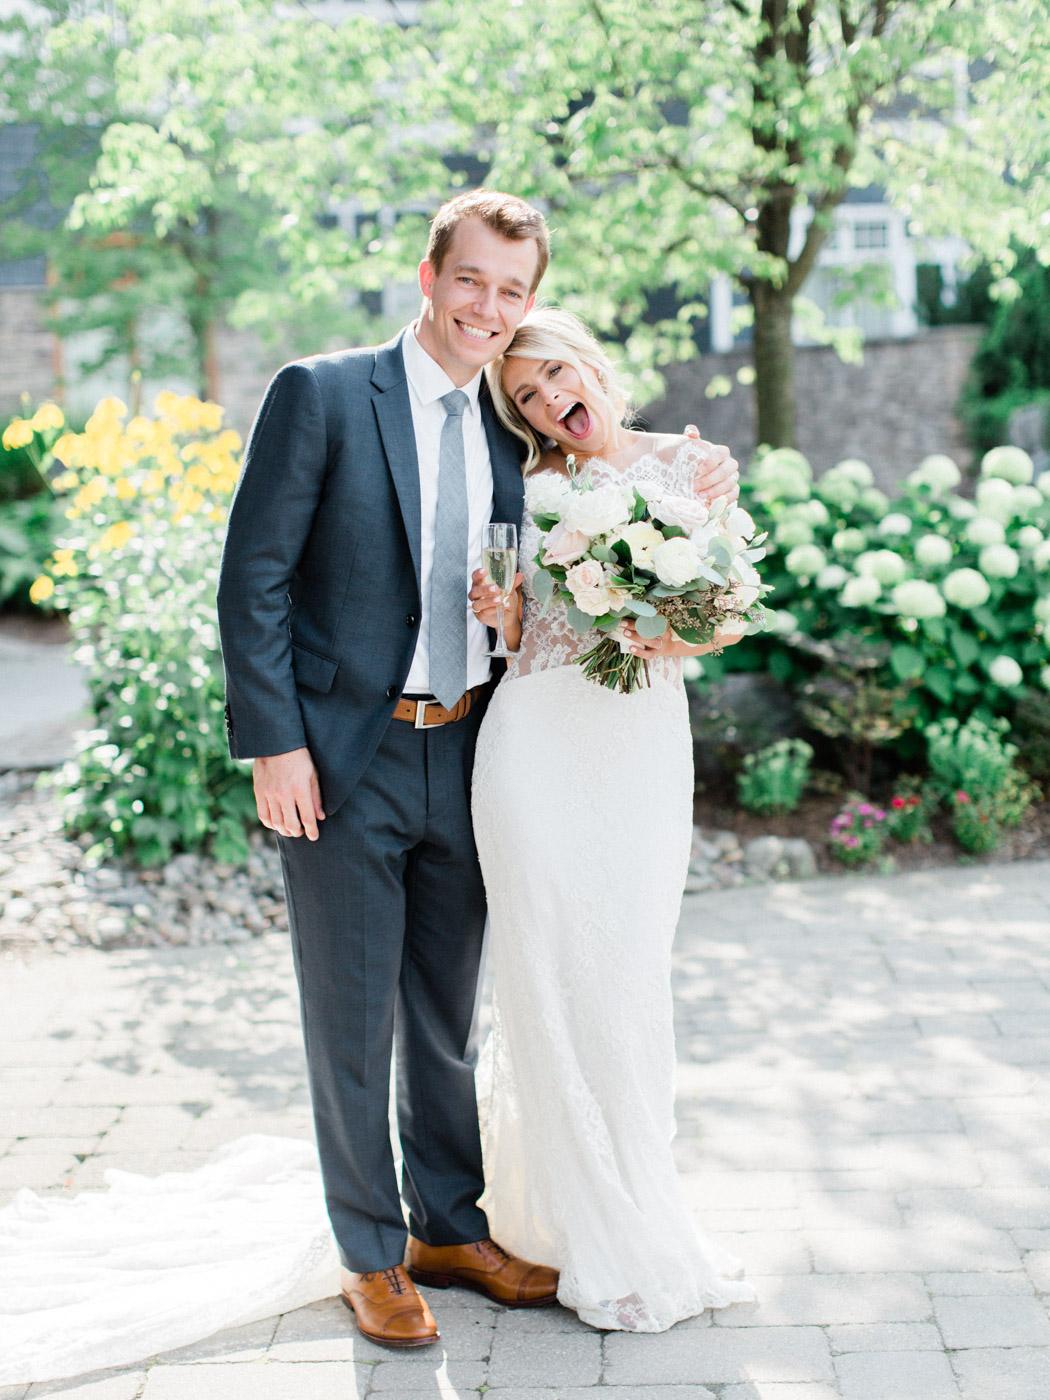 Toronto-Collingwood-Muskoka-Wedding-photographer-ideal-wedding-day-photography-timeline2.jpg